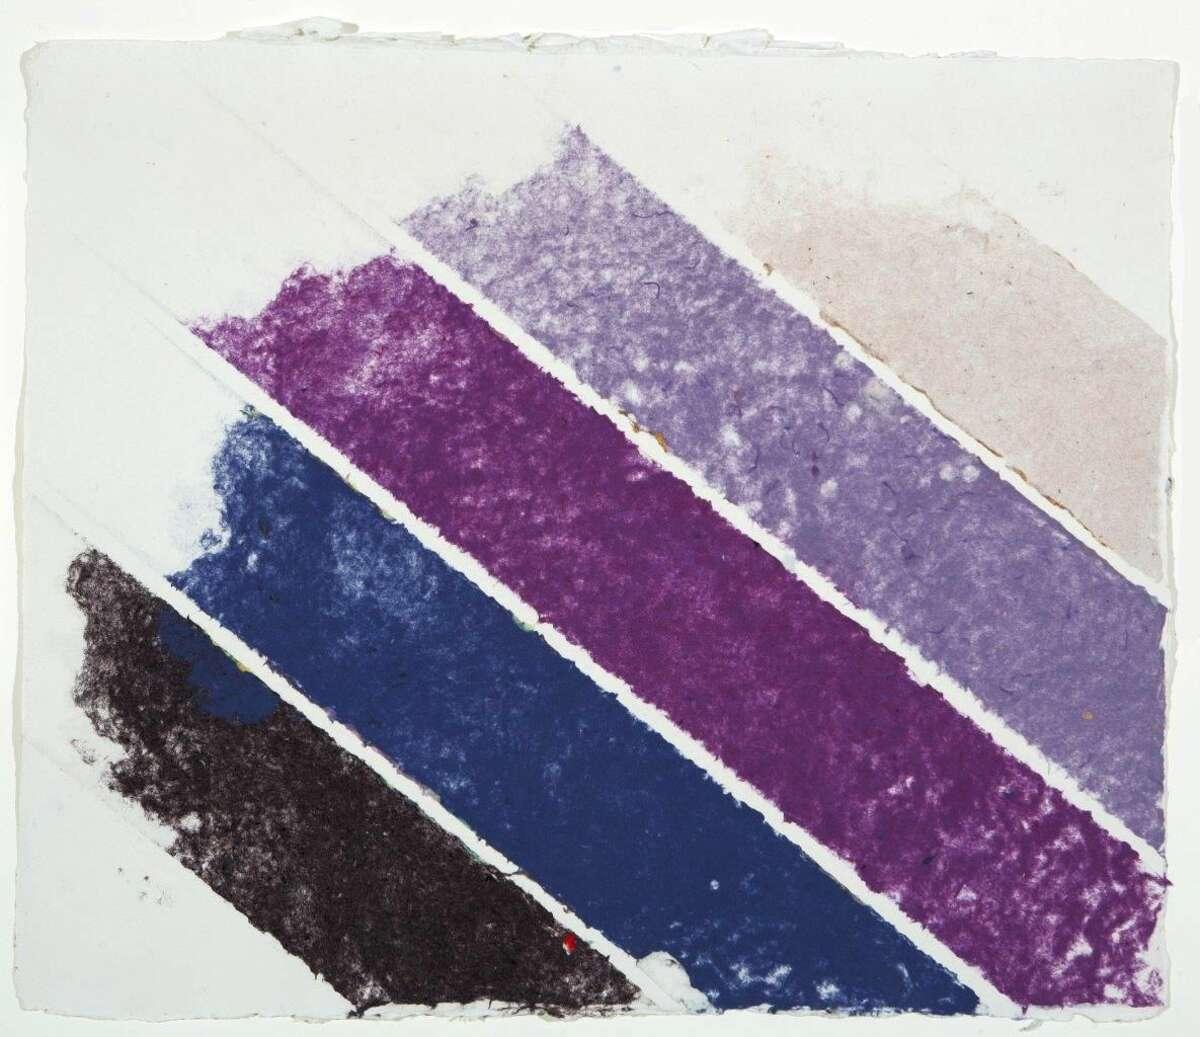 Kenneth NolandUntitled, 1981Handmade Paper26 1/2 x 30 1/2 inches